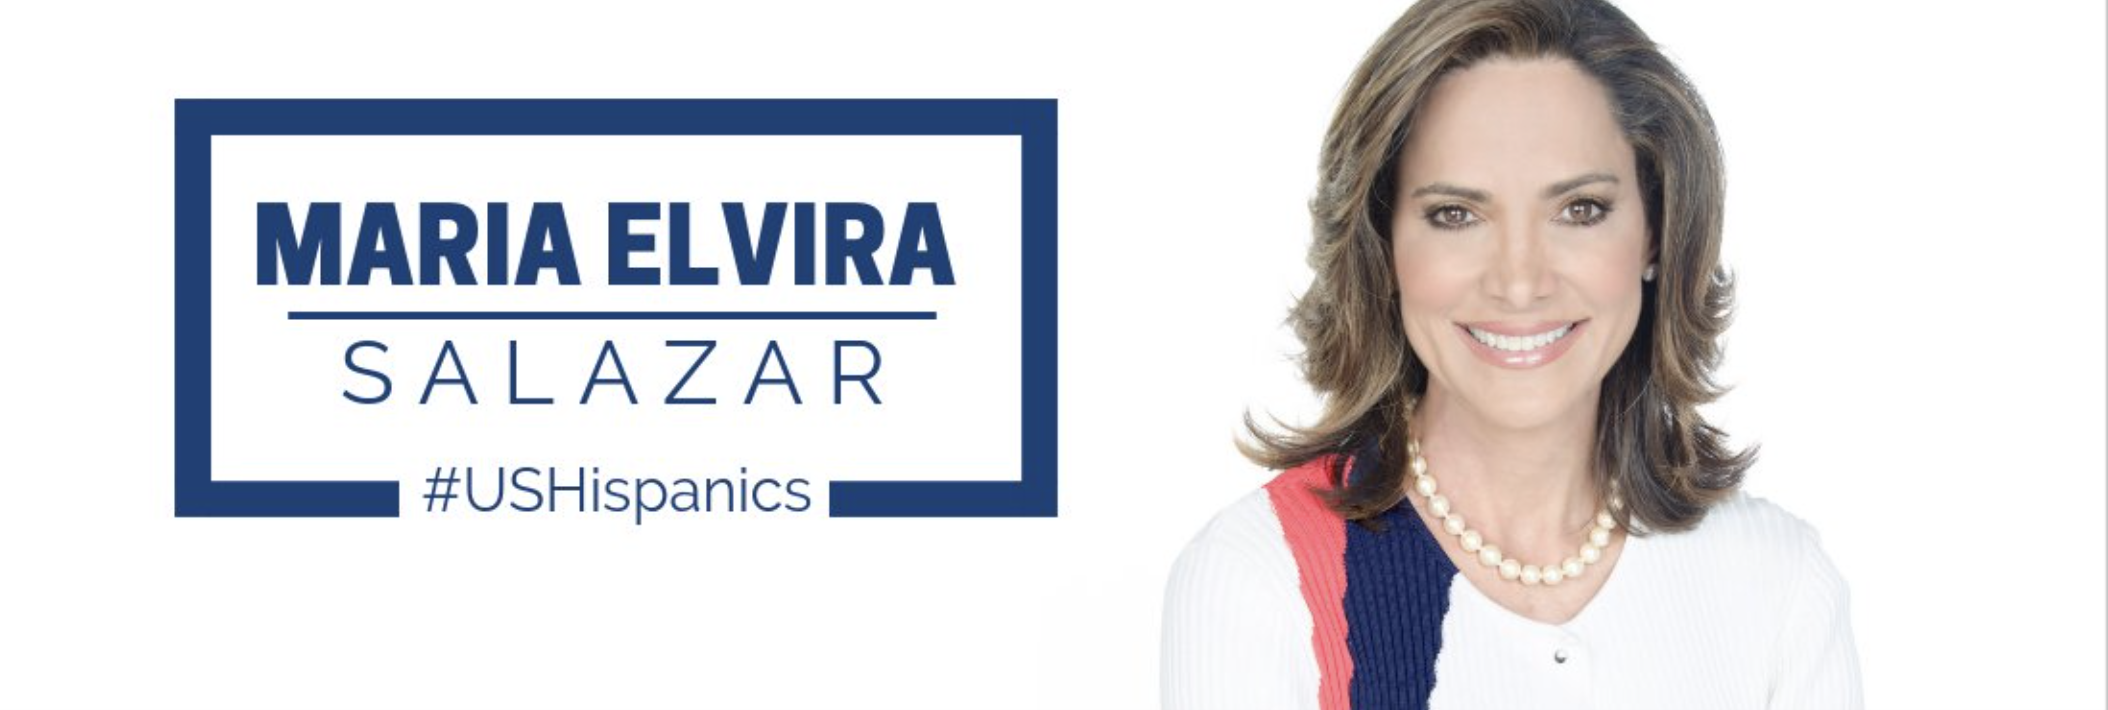 Elvira Salazar to Challenge Shalala in 2020